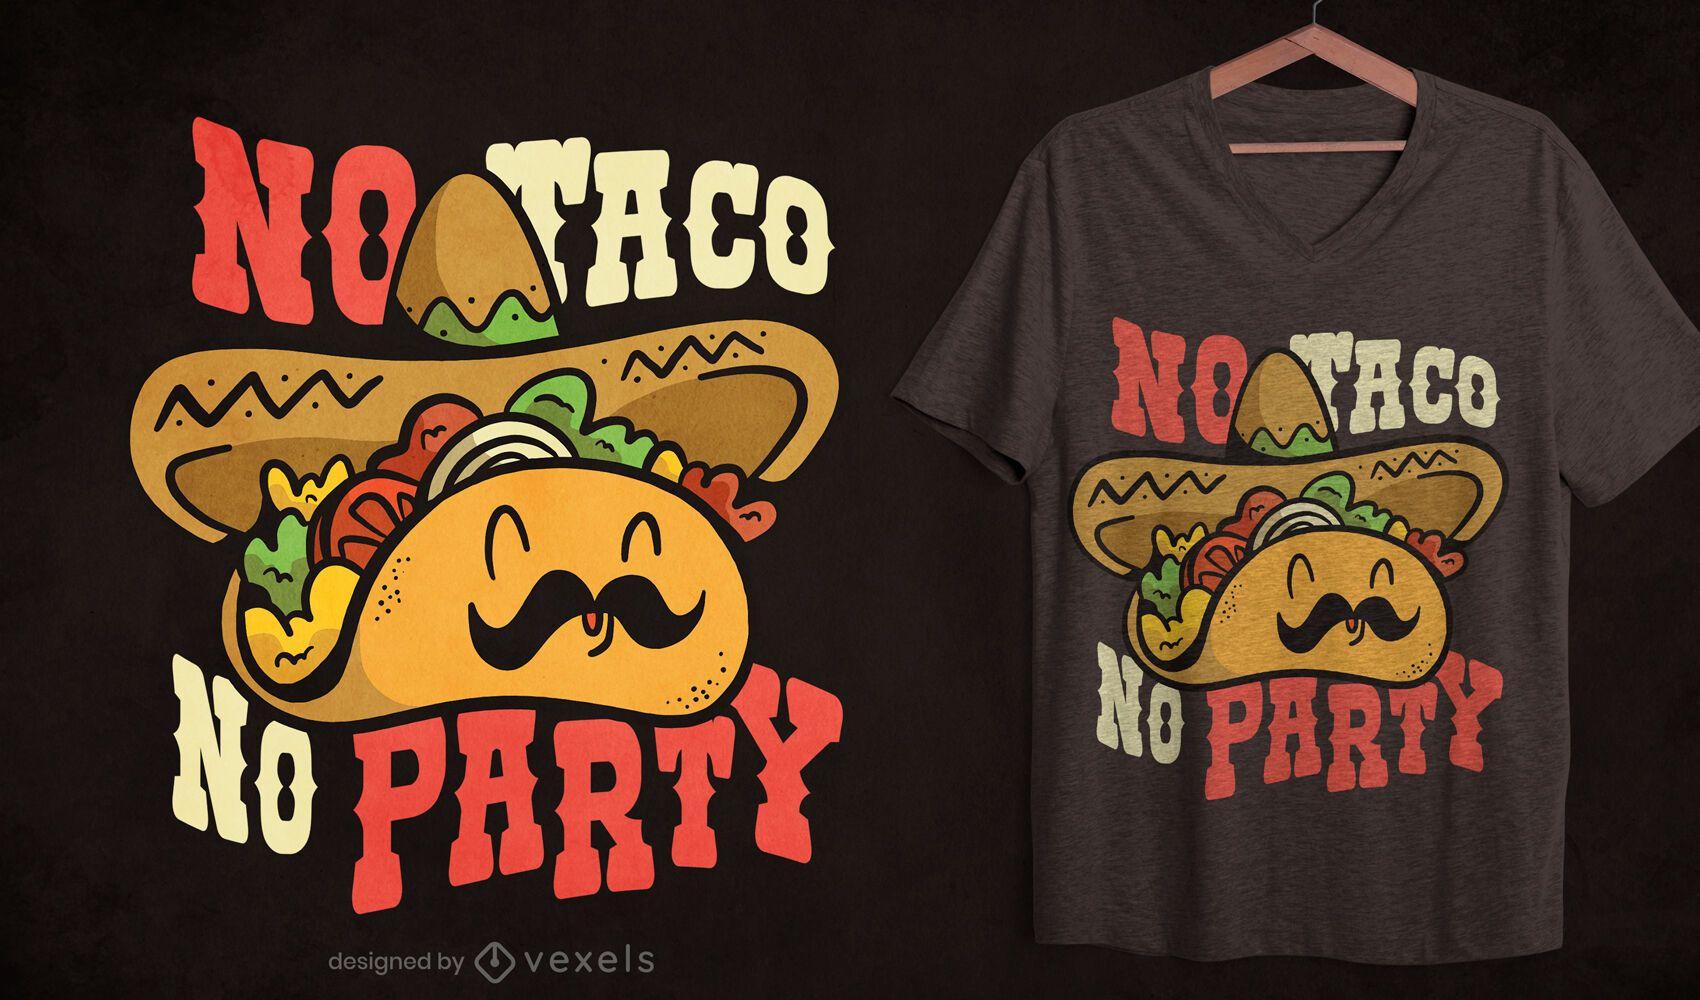 Dise?o de camiseta de dibujos animados de fiesta de tacos mexicanos